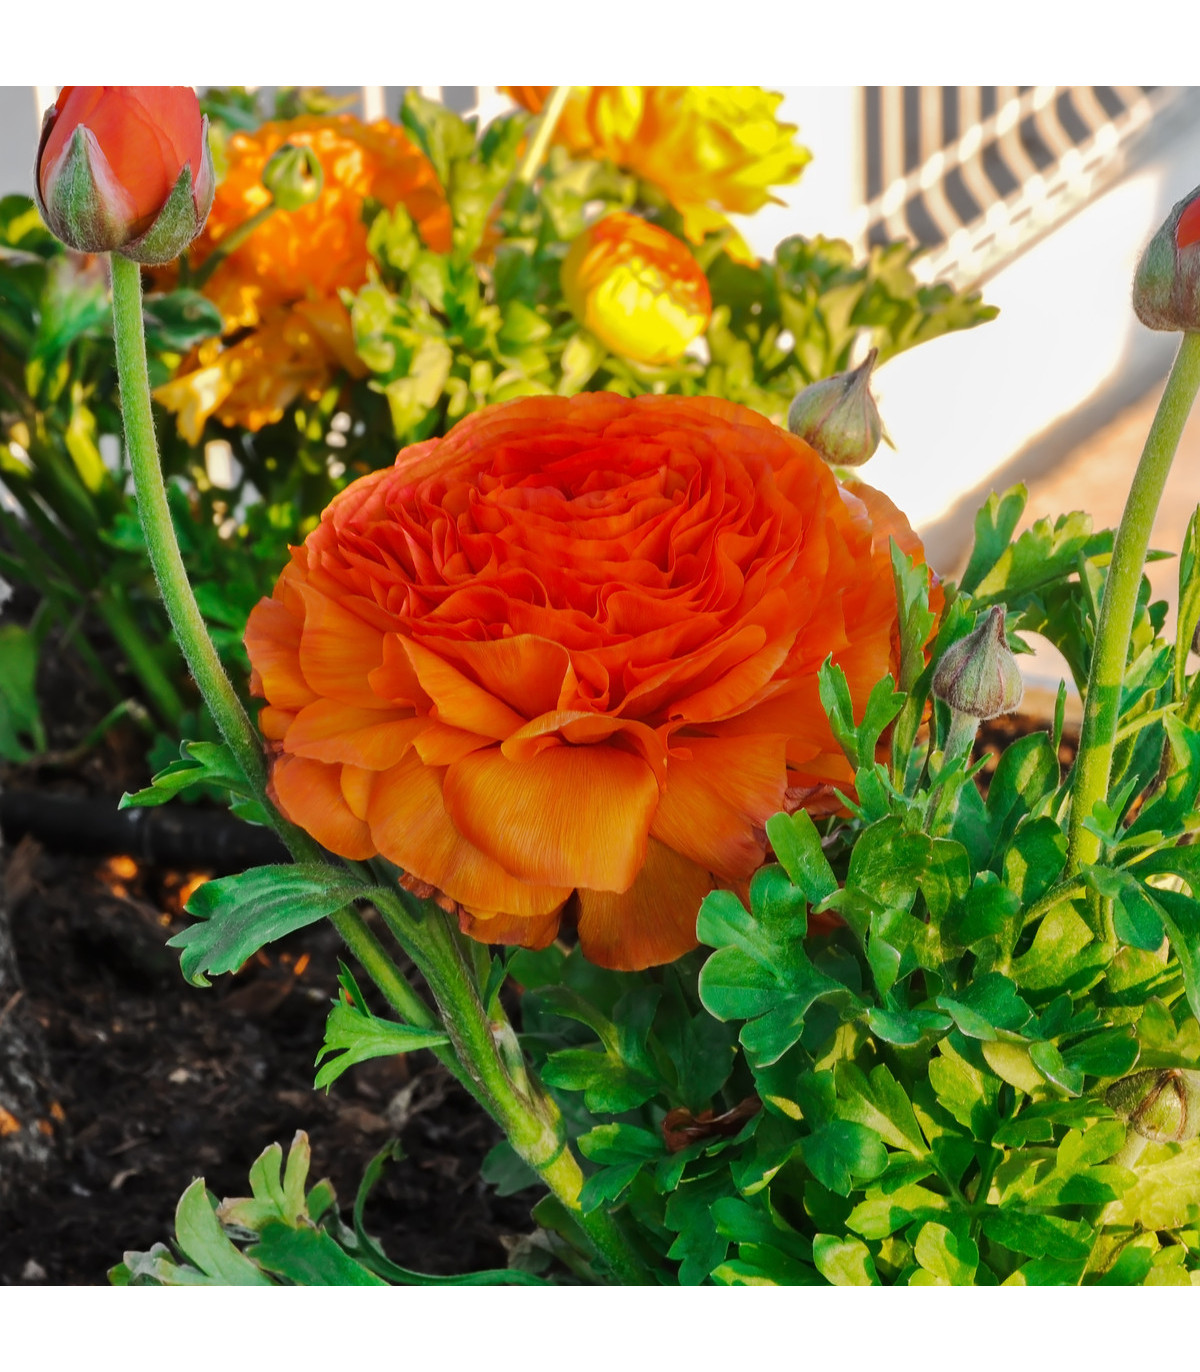 Iskerník oranžový - Ranunculus asiaticus - cibuľoviny - 3 ks